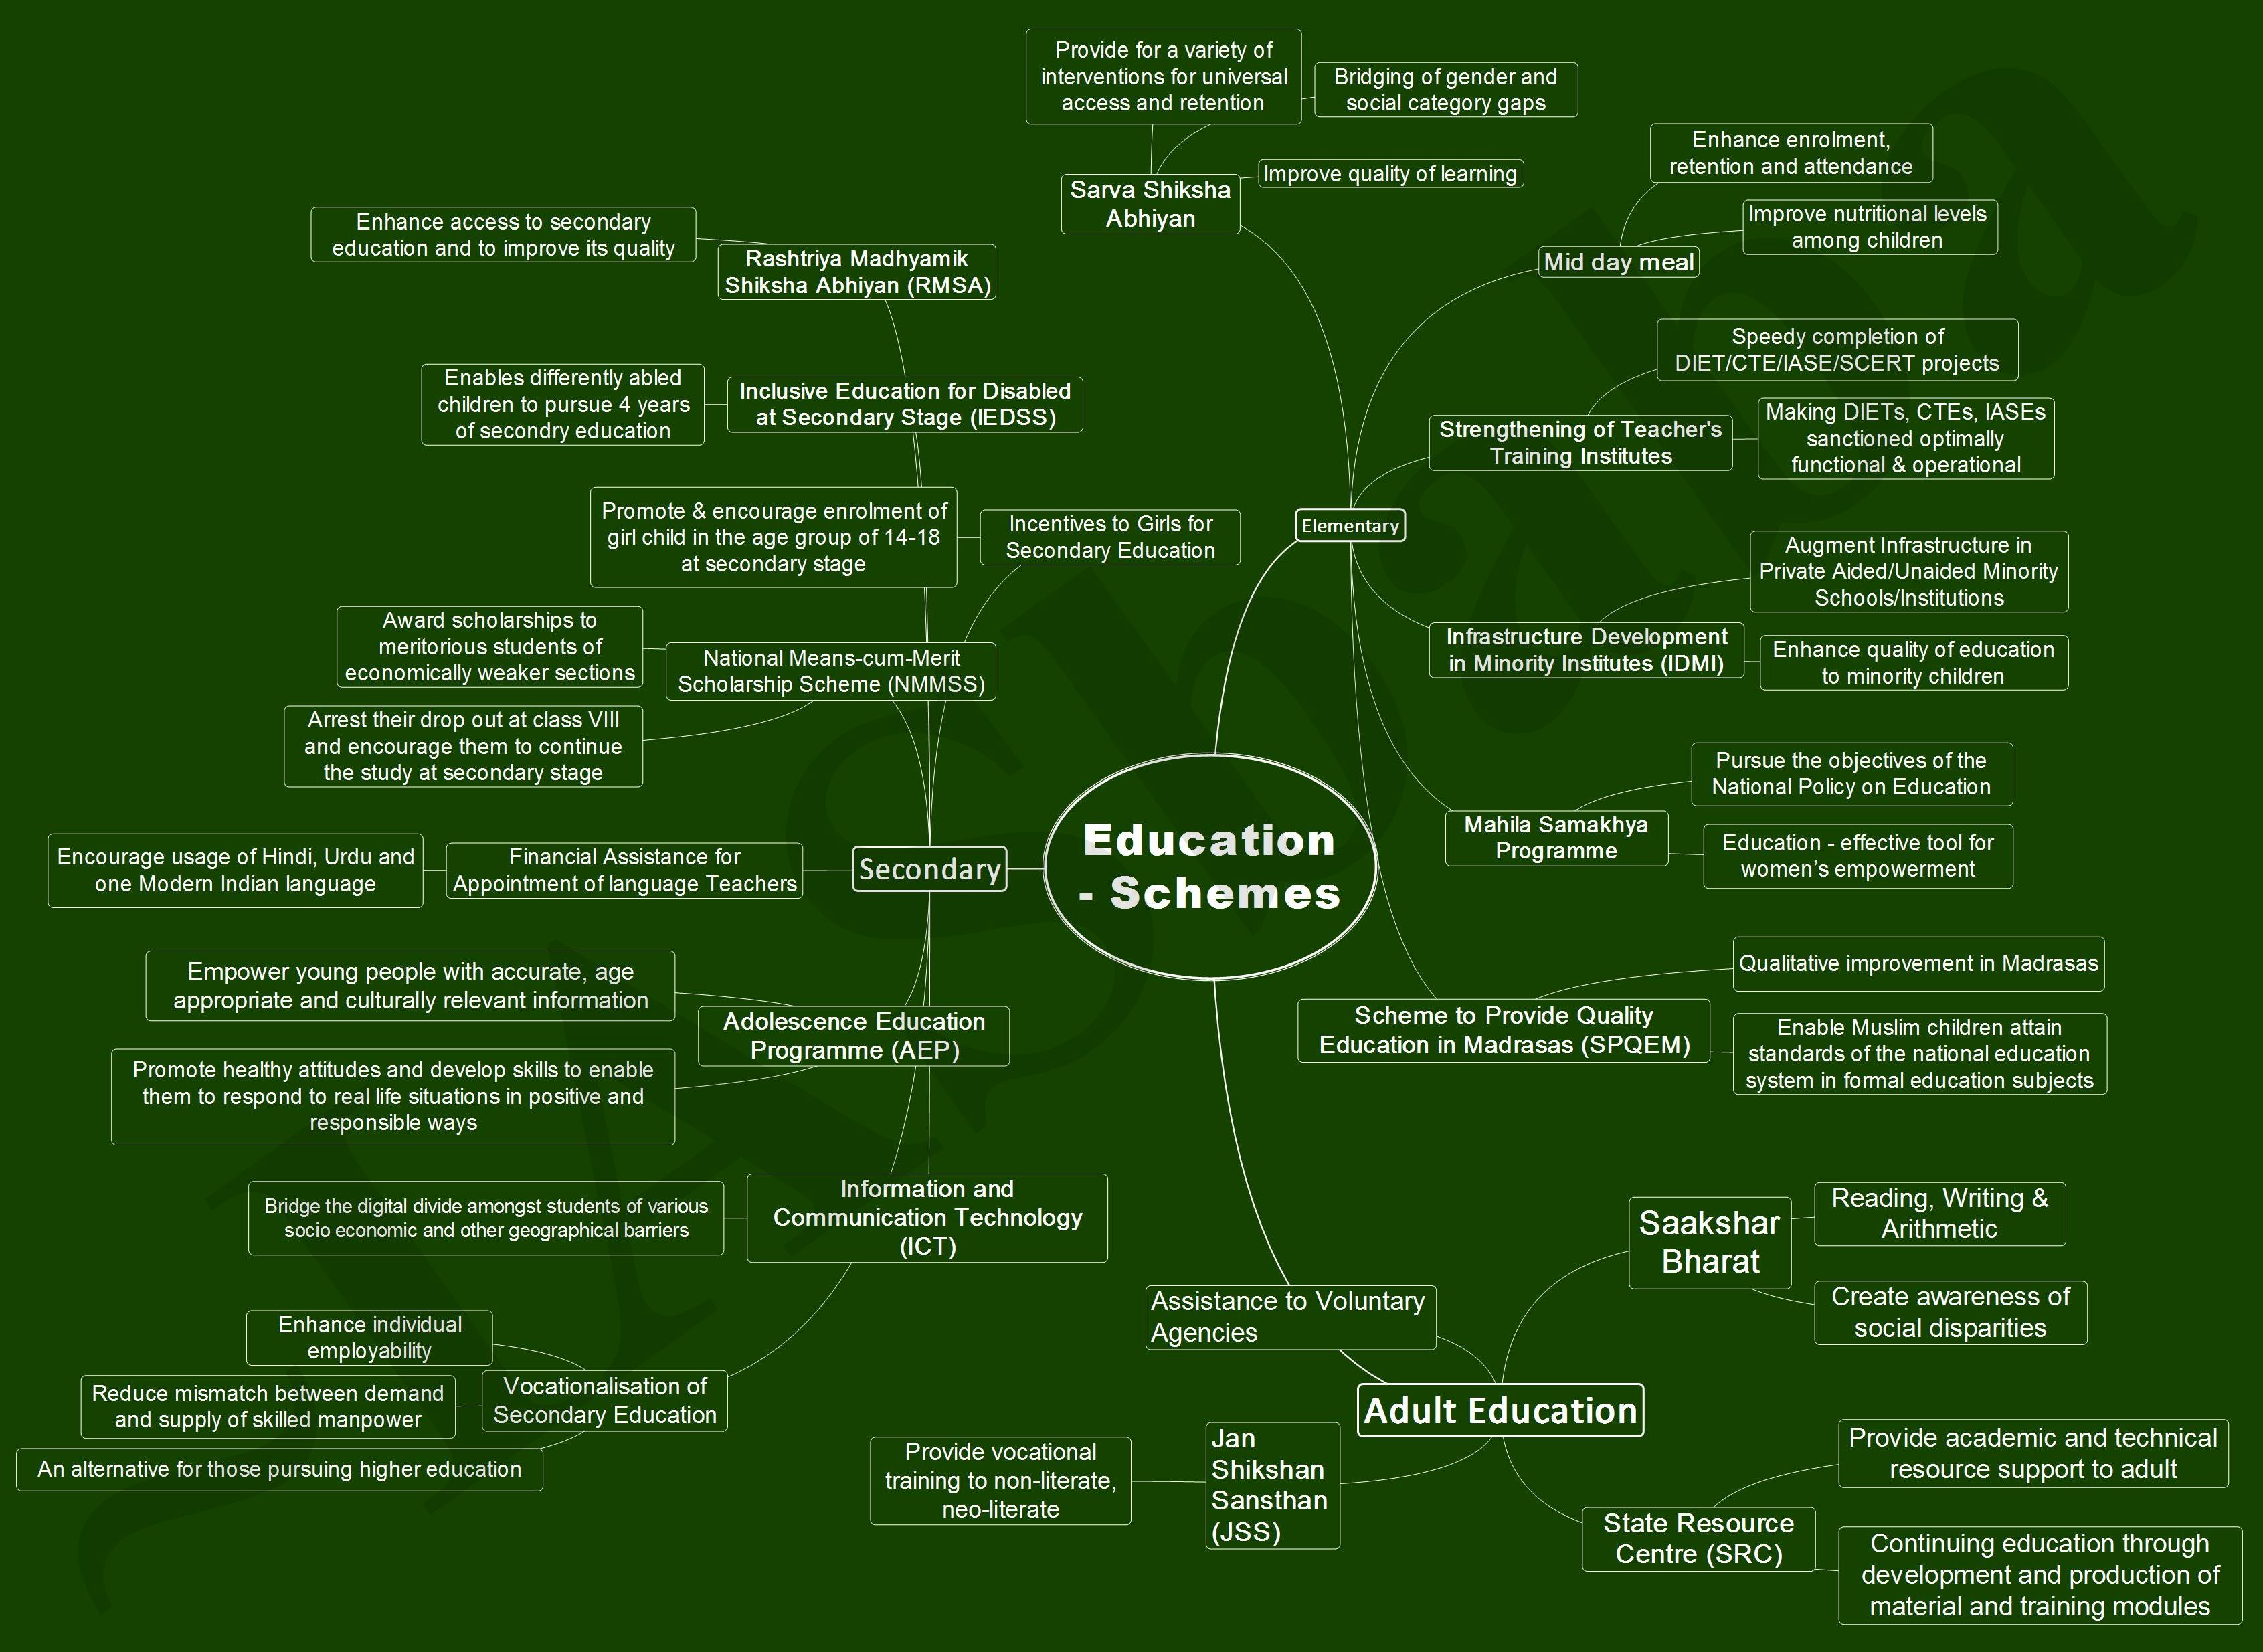 IASbaba-Education Schemes